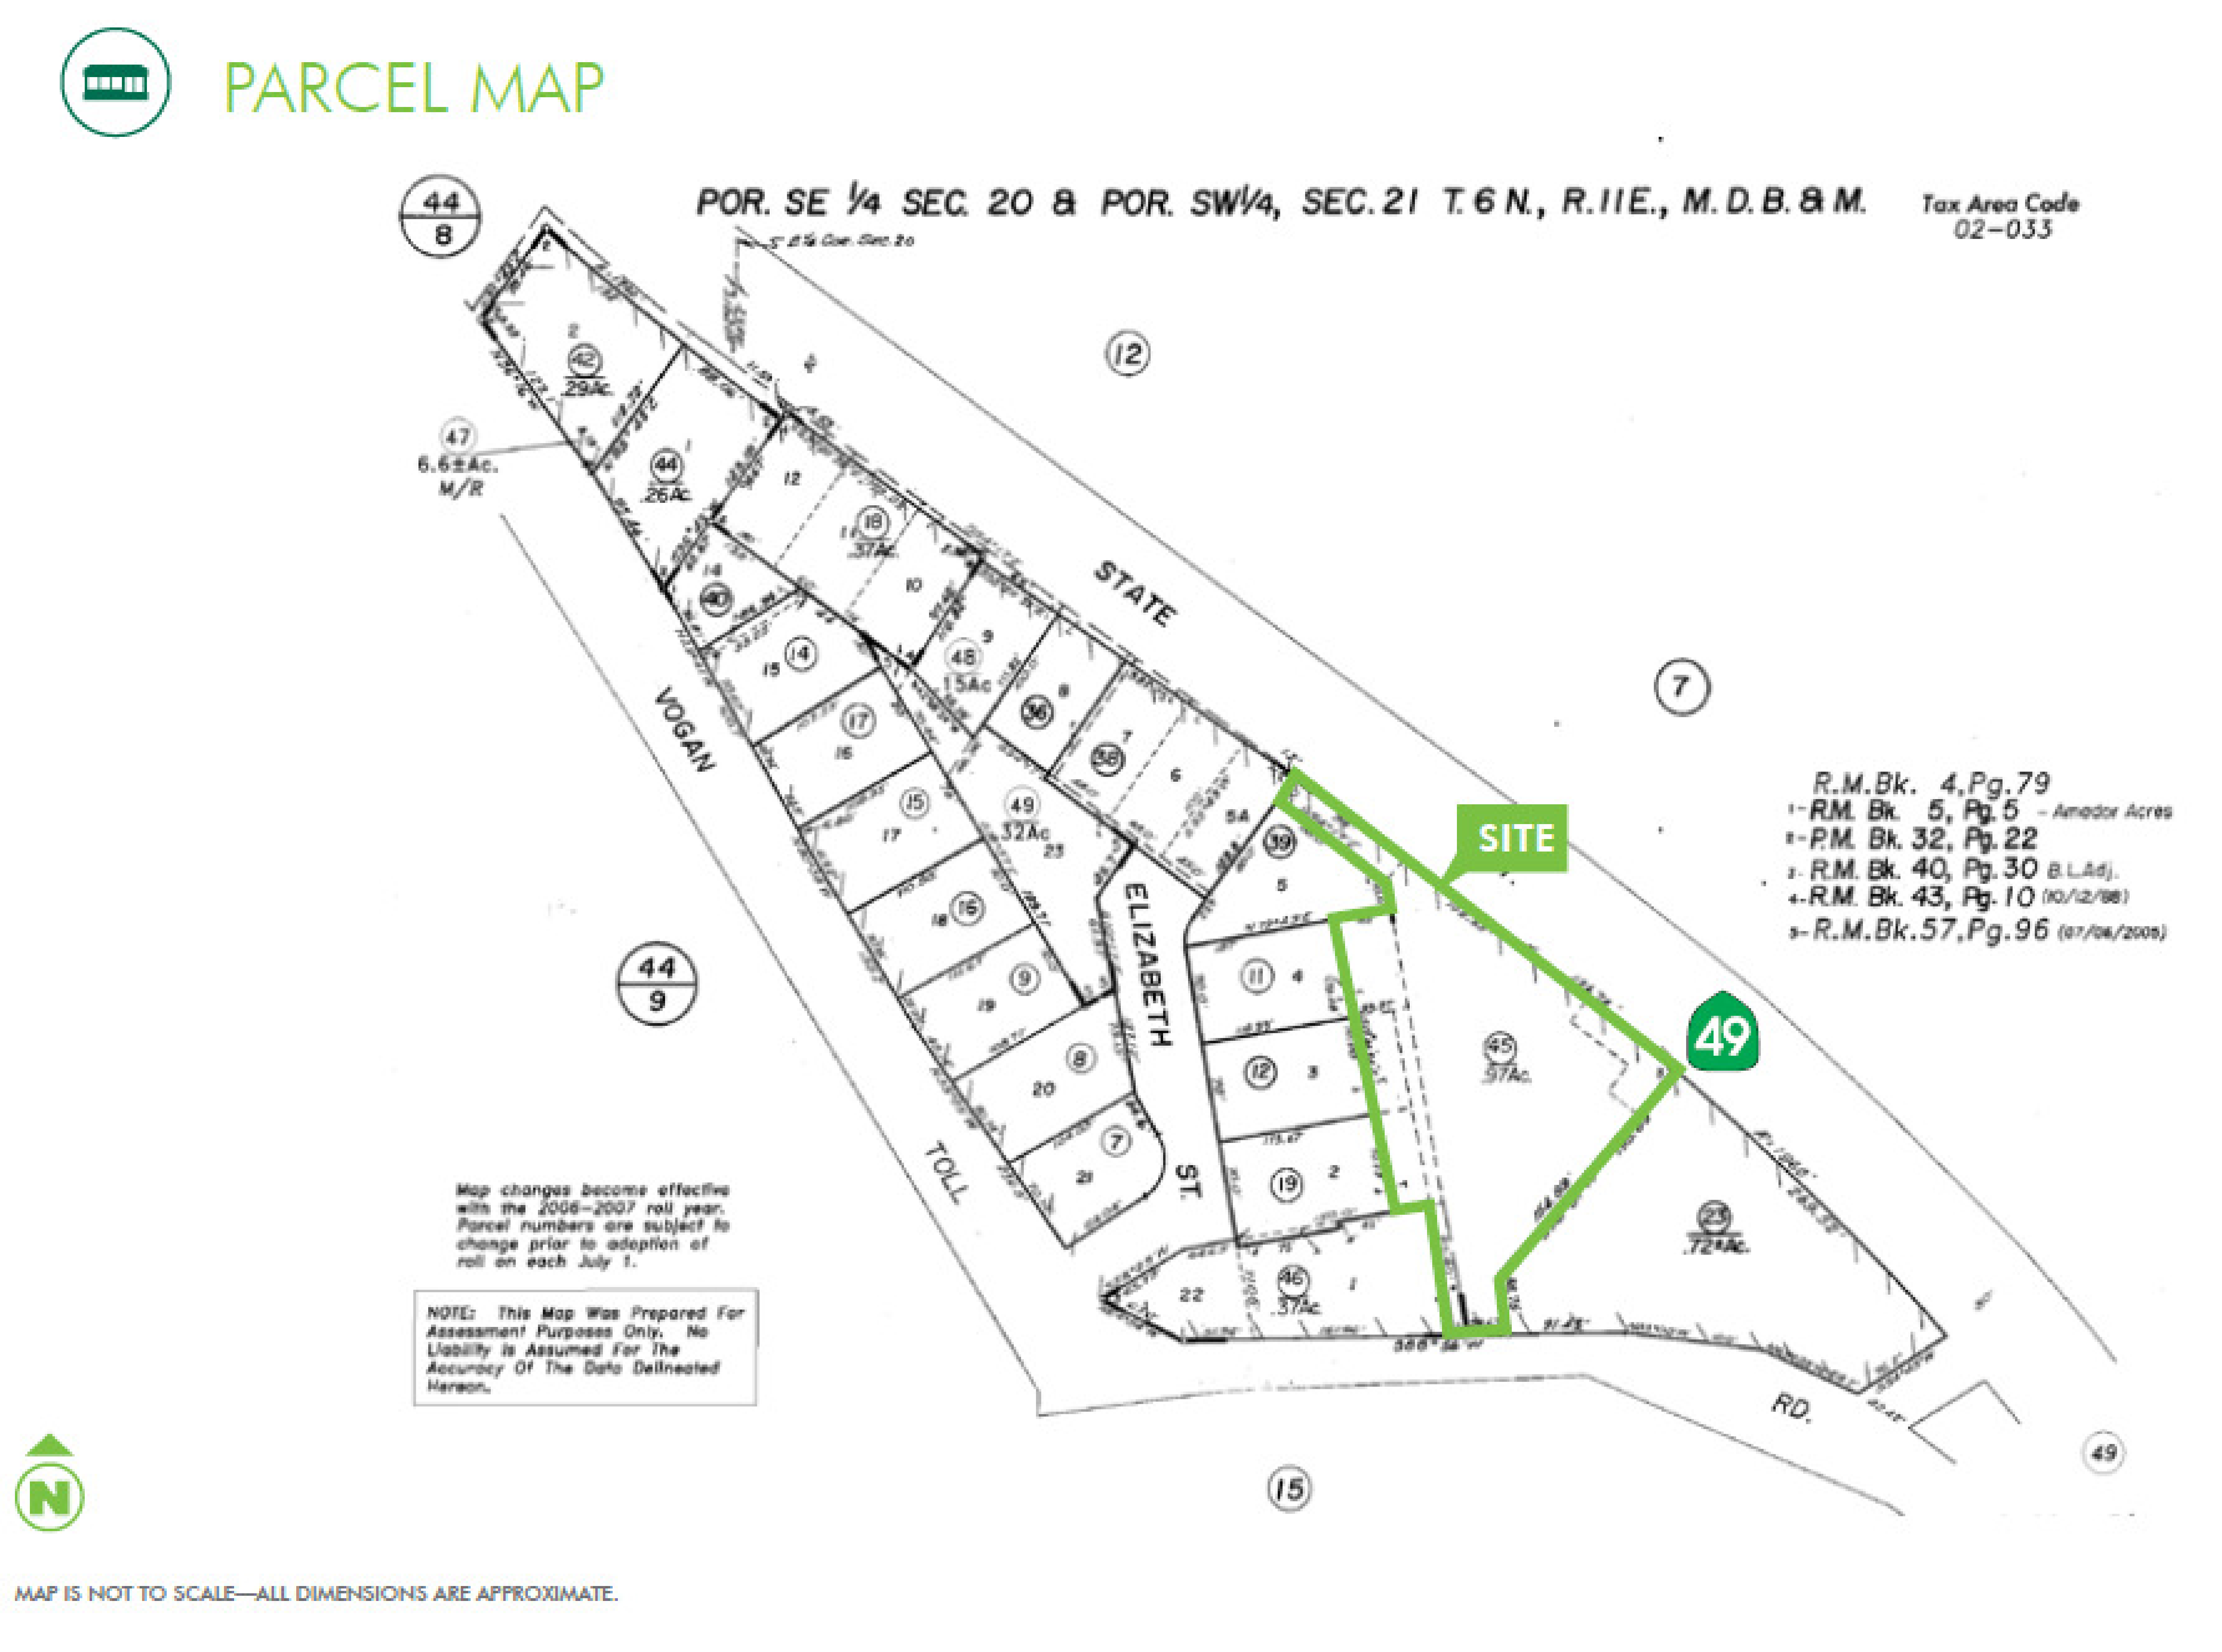 Automotive Building - 747 Highway 49: site plan